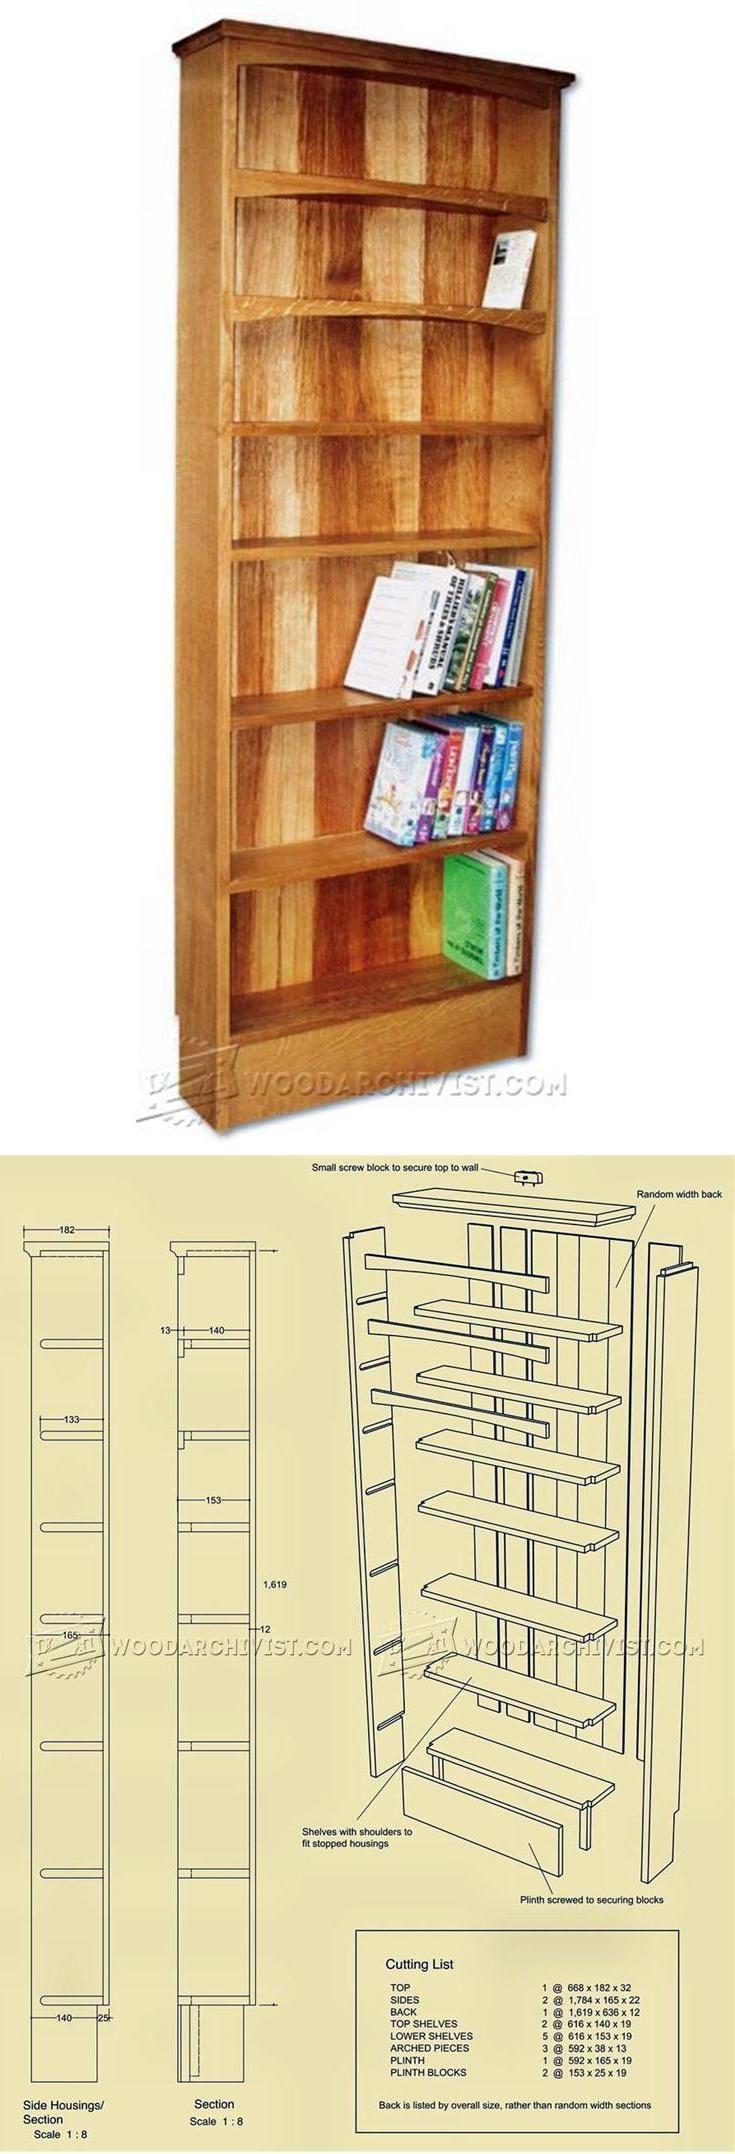 Narrow Book Shelves Plans - Furniture Plans and Projects | WoodArchivist.com